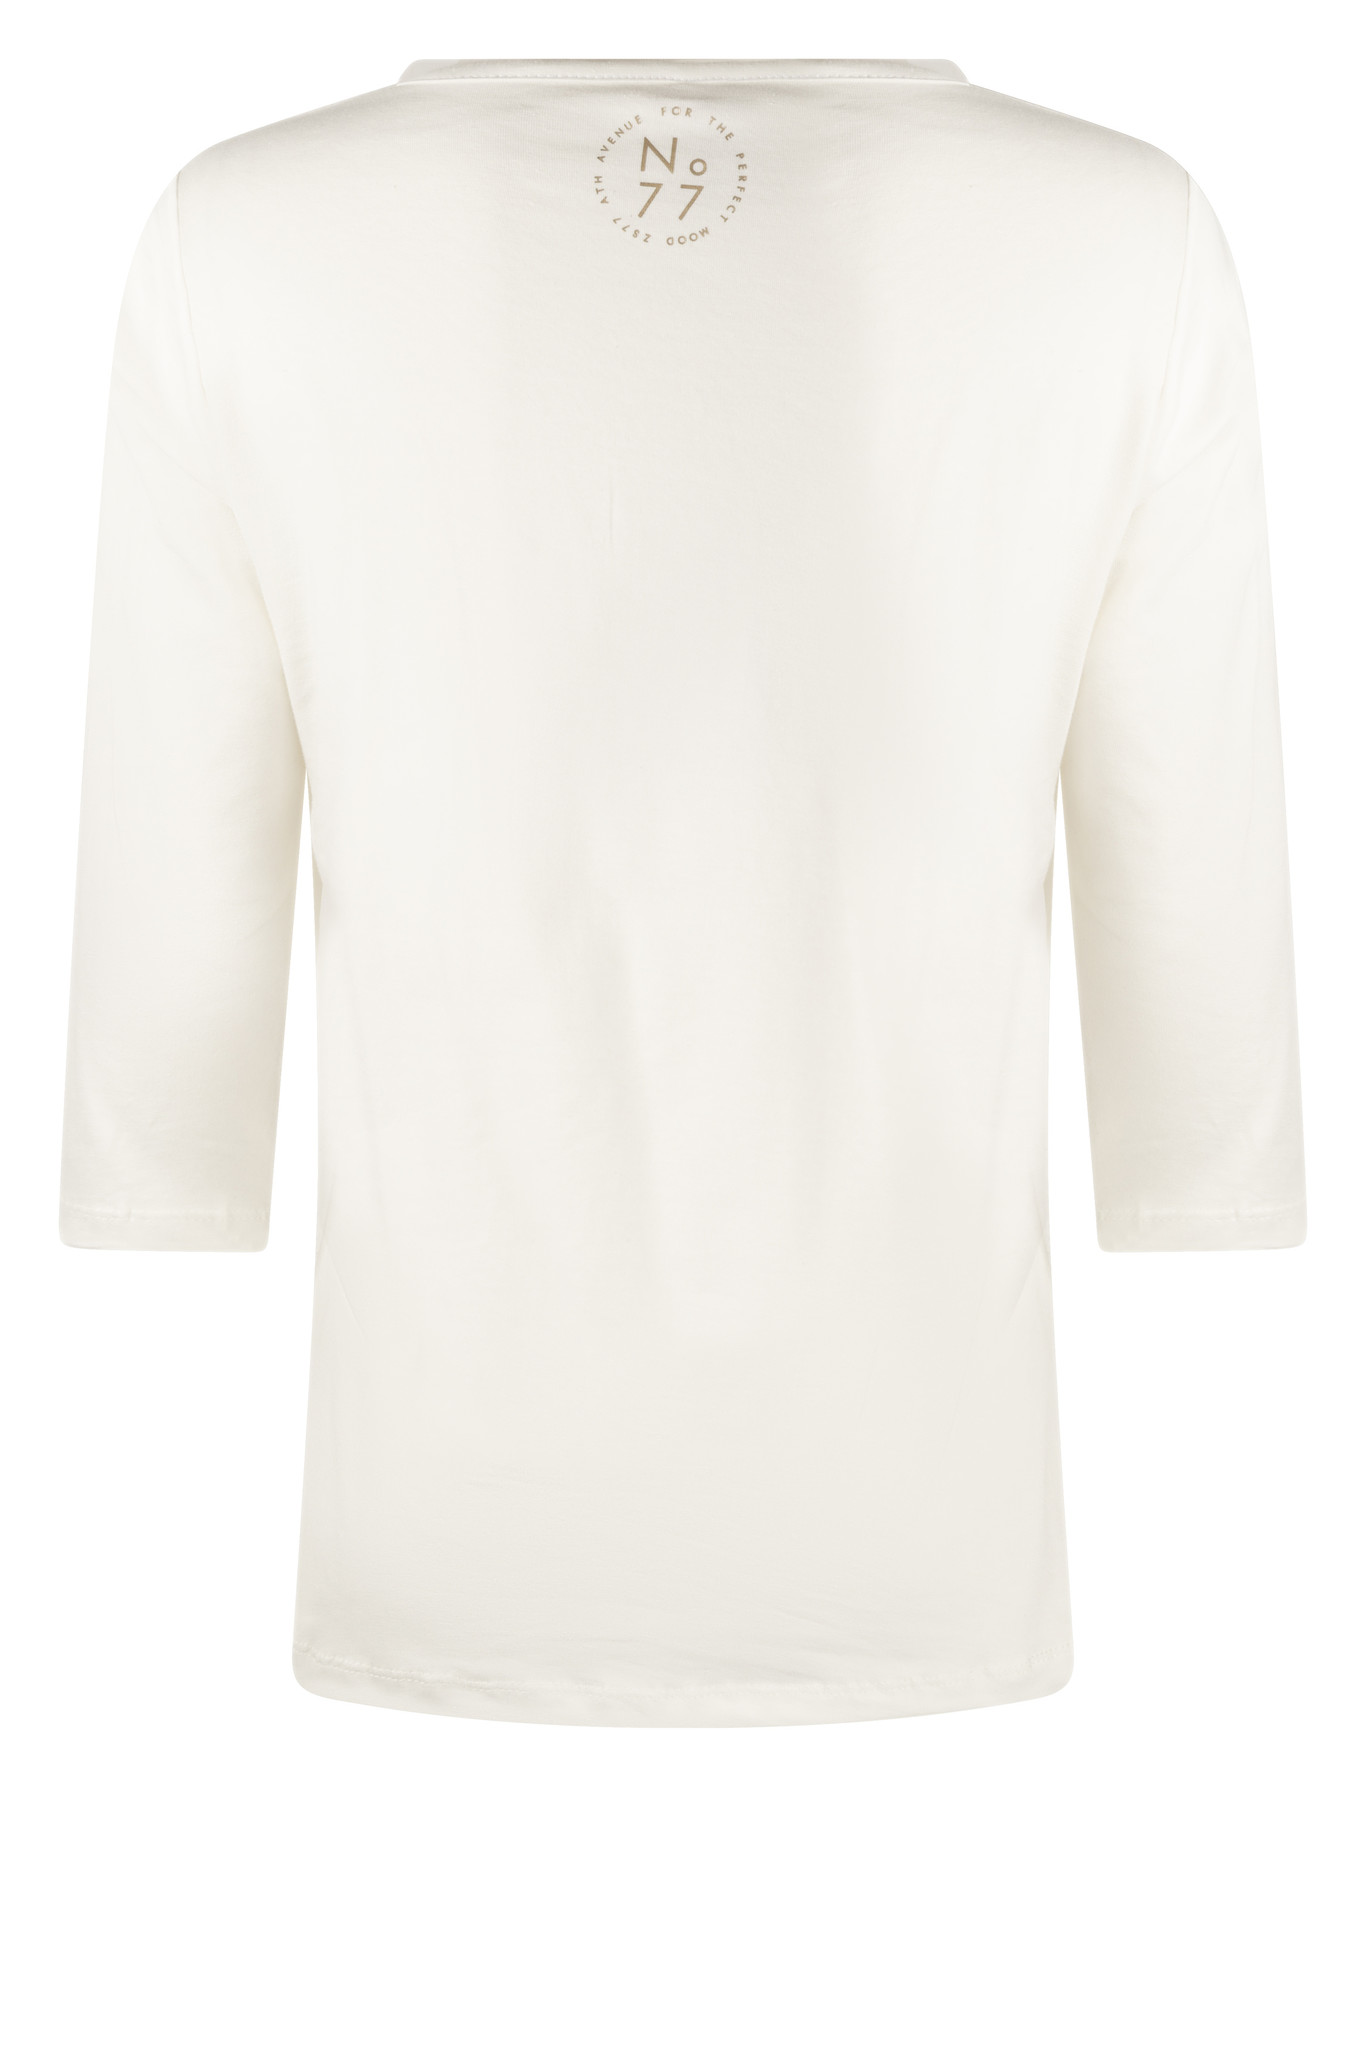 Zoso Zoso 215 Lindsy T-shirt with print